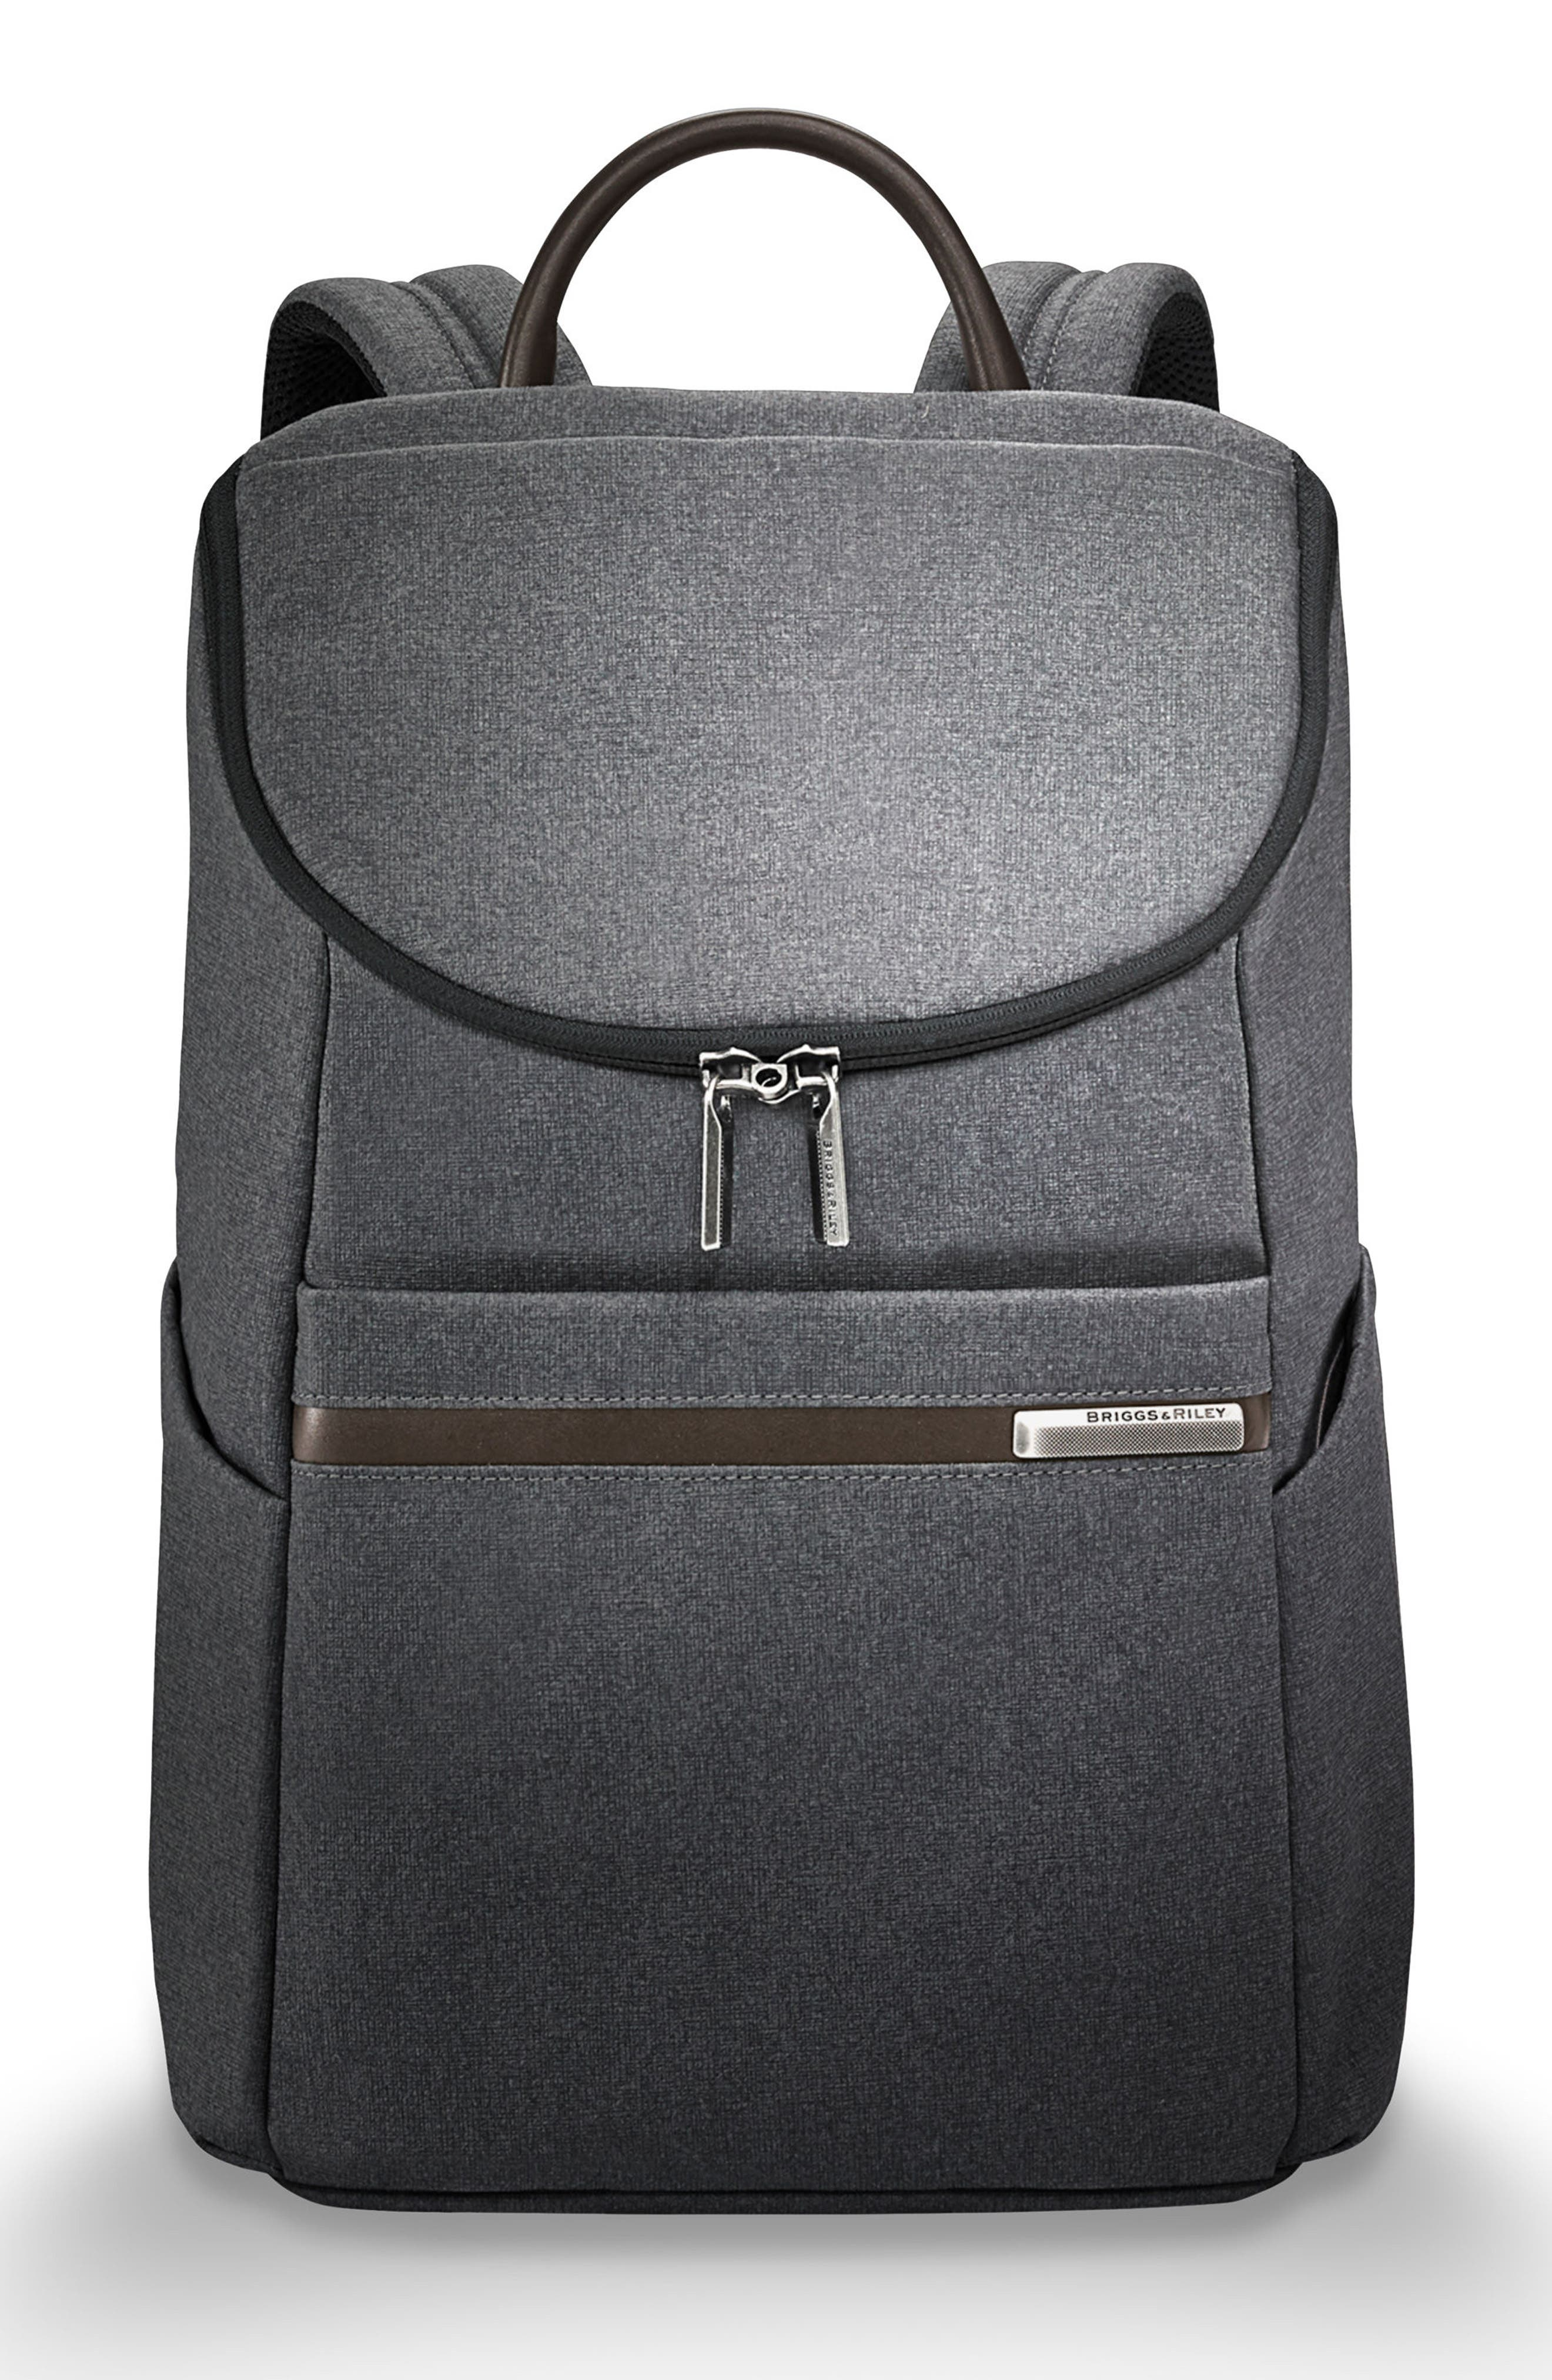 BRIGGS & RILEY Kinzie Street Backpack, Main, color, 025